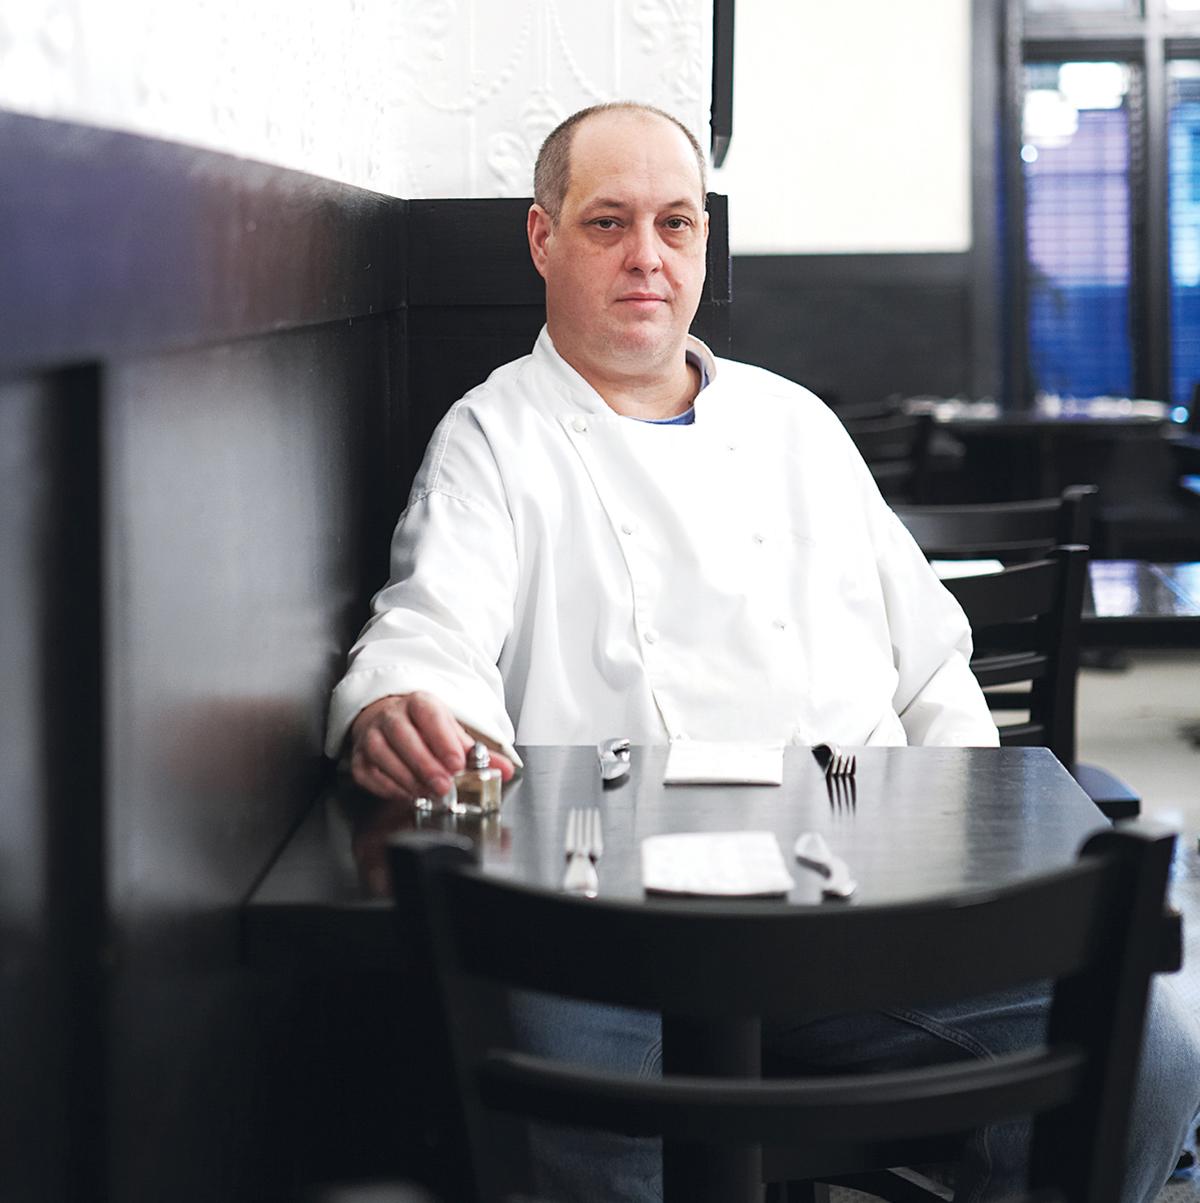 marliave chef